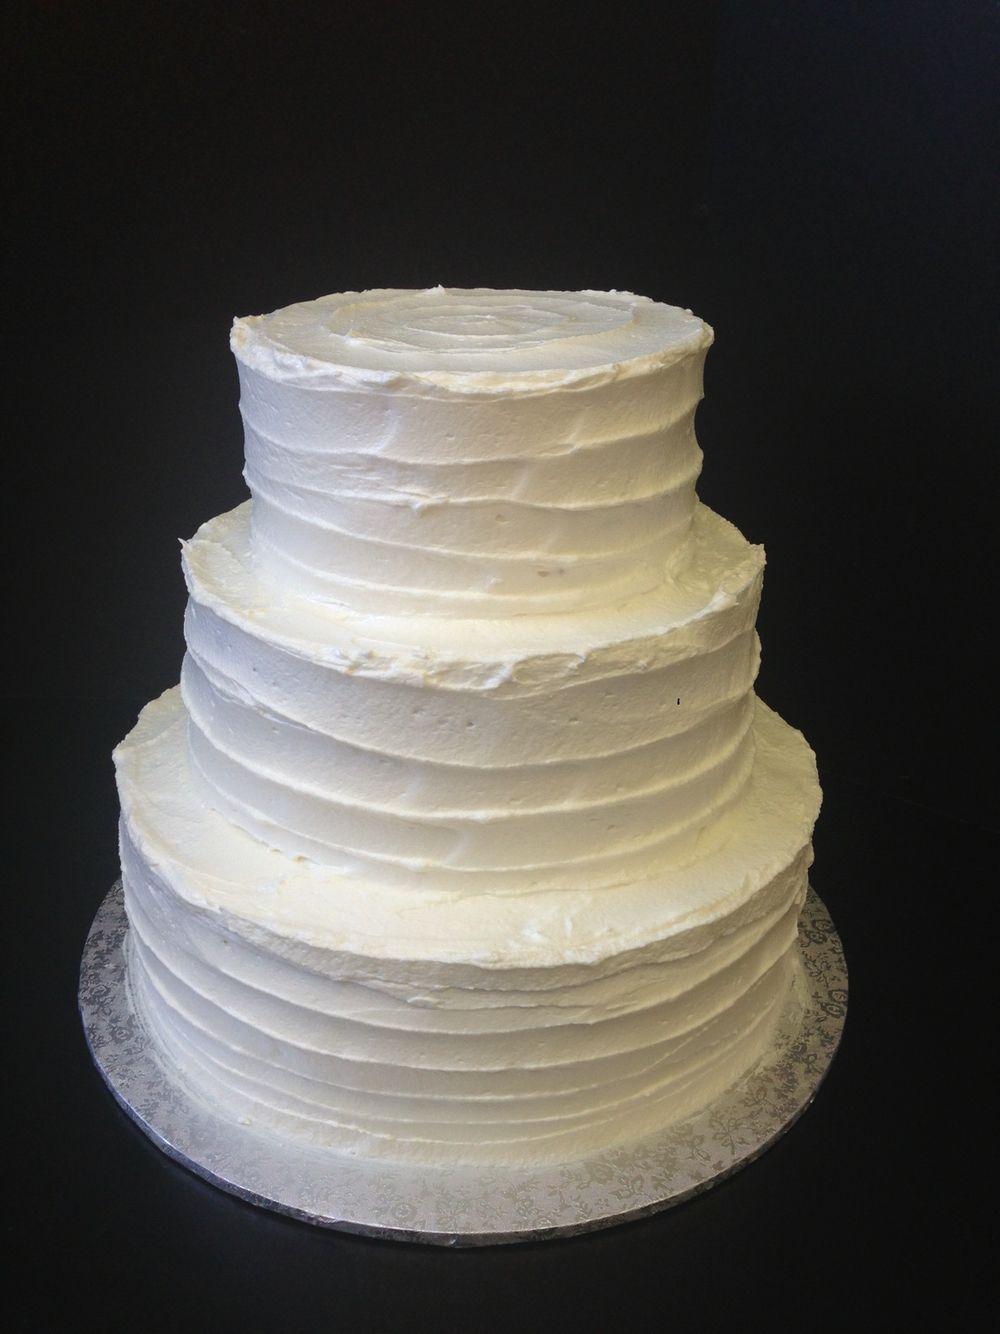 Texture icing wedding cake